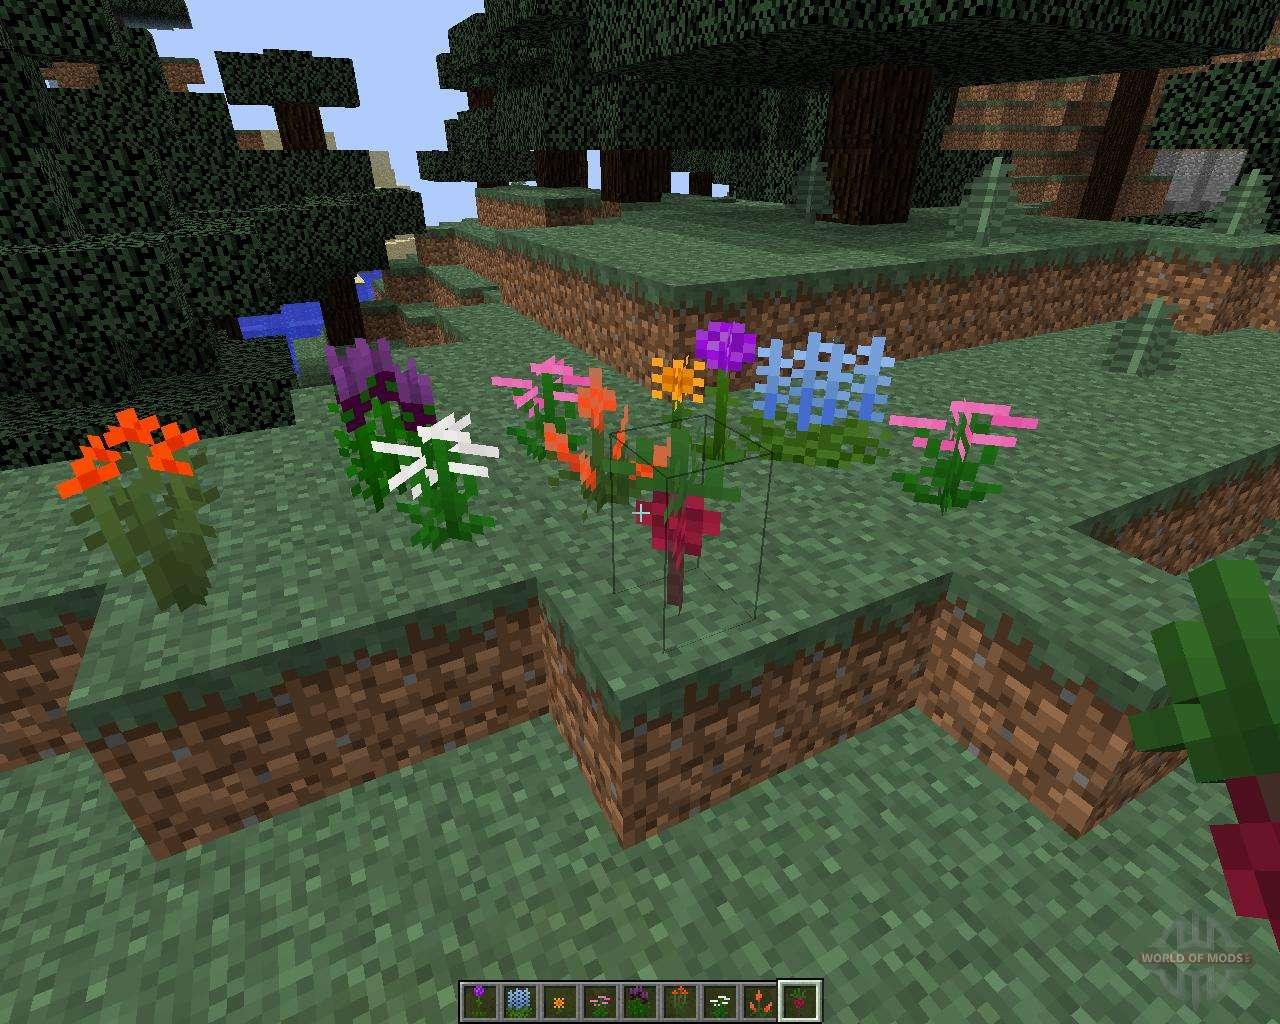 моды для майнкрафт 1.7.10 на растения #6